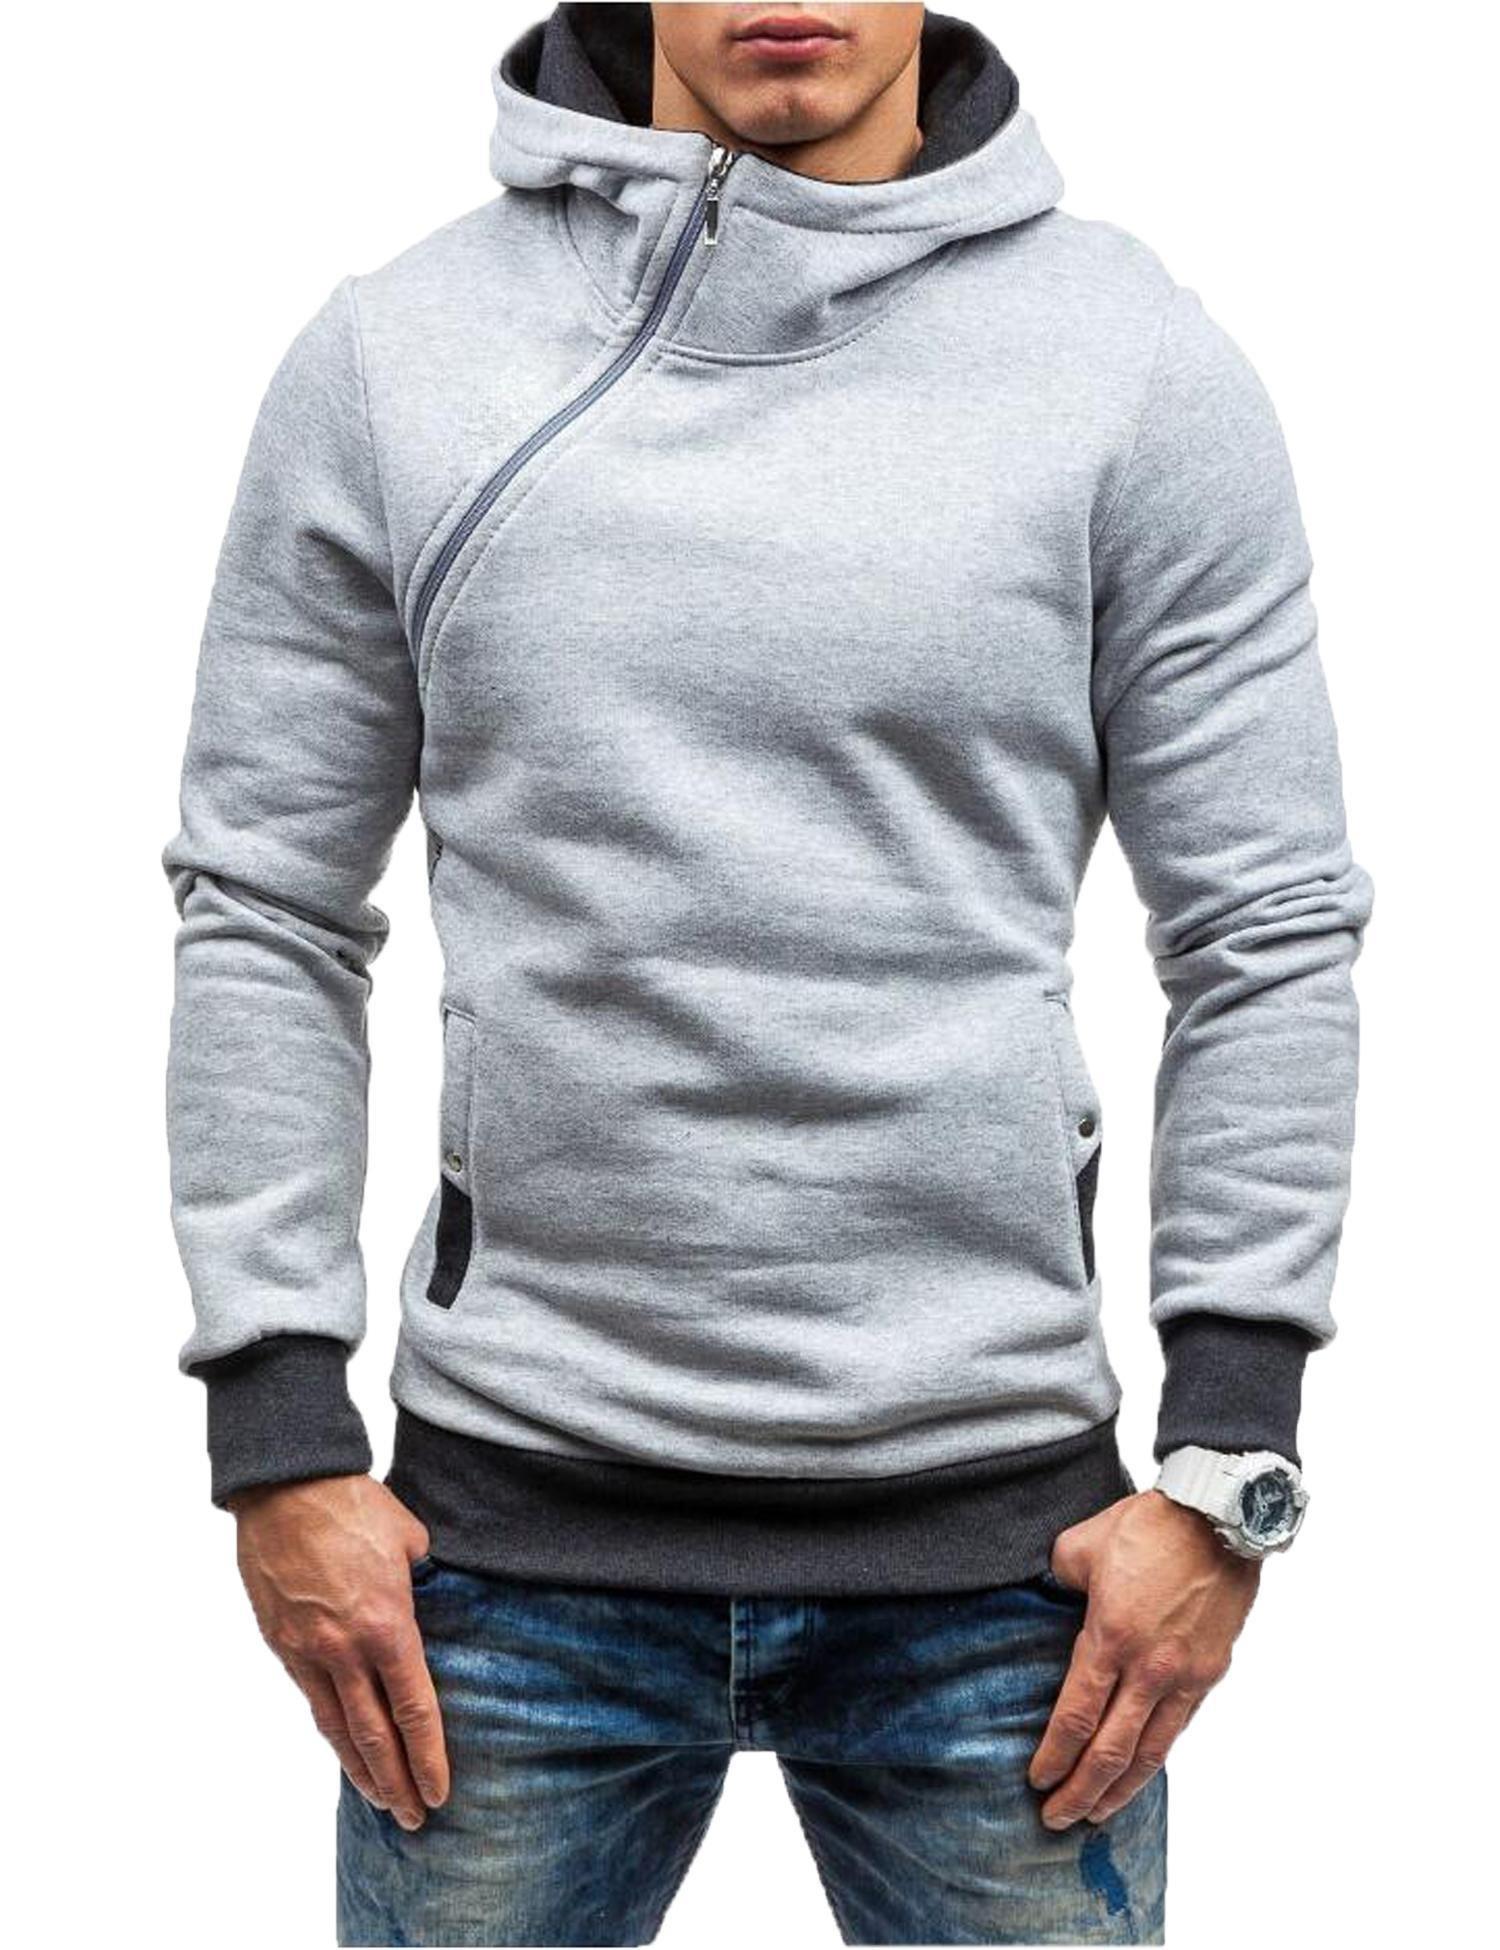 Zuckerfan Men's Long Sleeve Patchwork Slanted Zipper Pullover Casual Fleece Hoodies with Pockets(LGR,S)